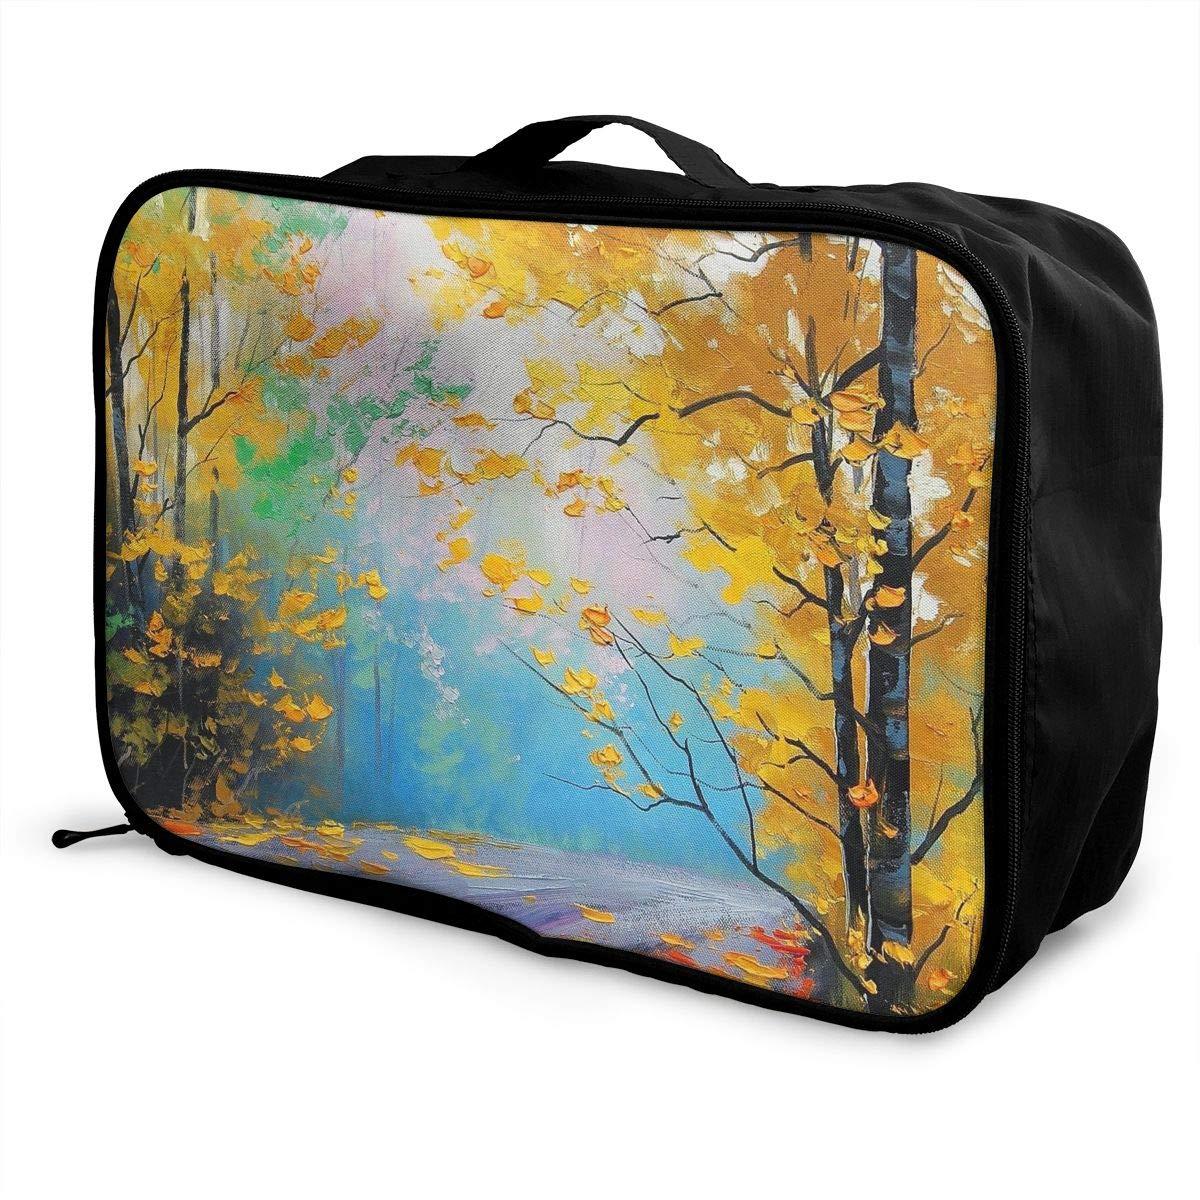 Travel Luggage Duffle Bag Lightweight Portable Handbag Trees Leaves Print Large Capacity Waterproof Foldable Storage Tote